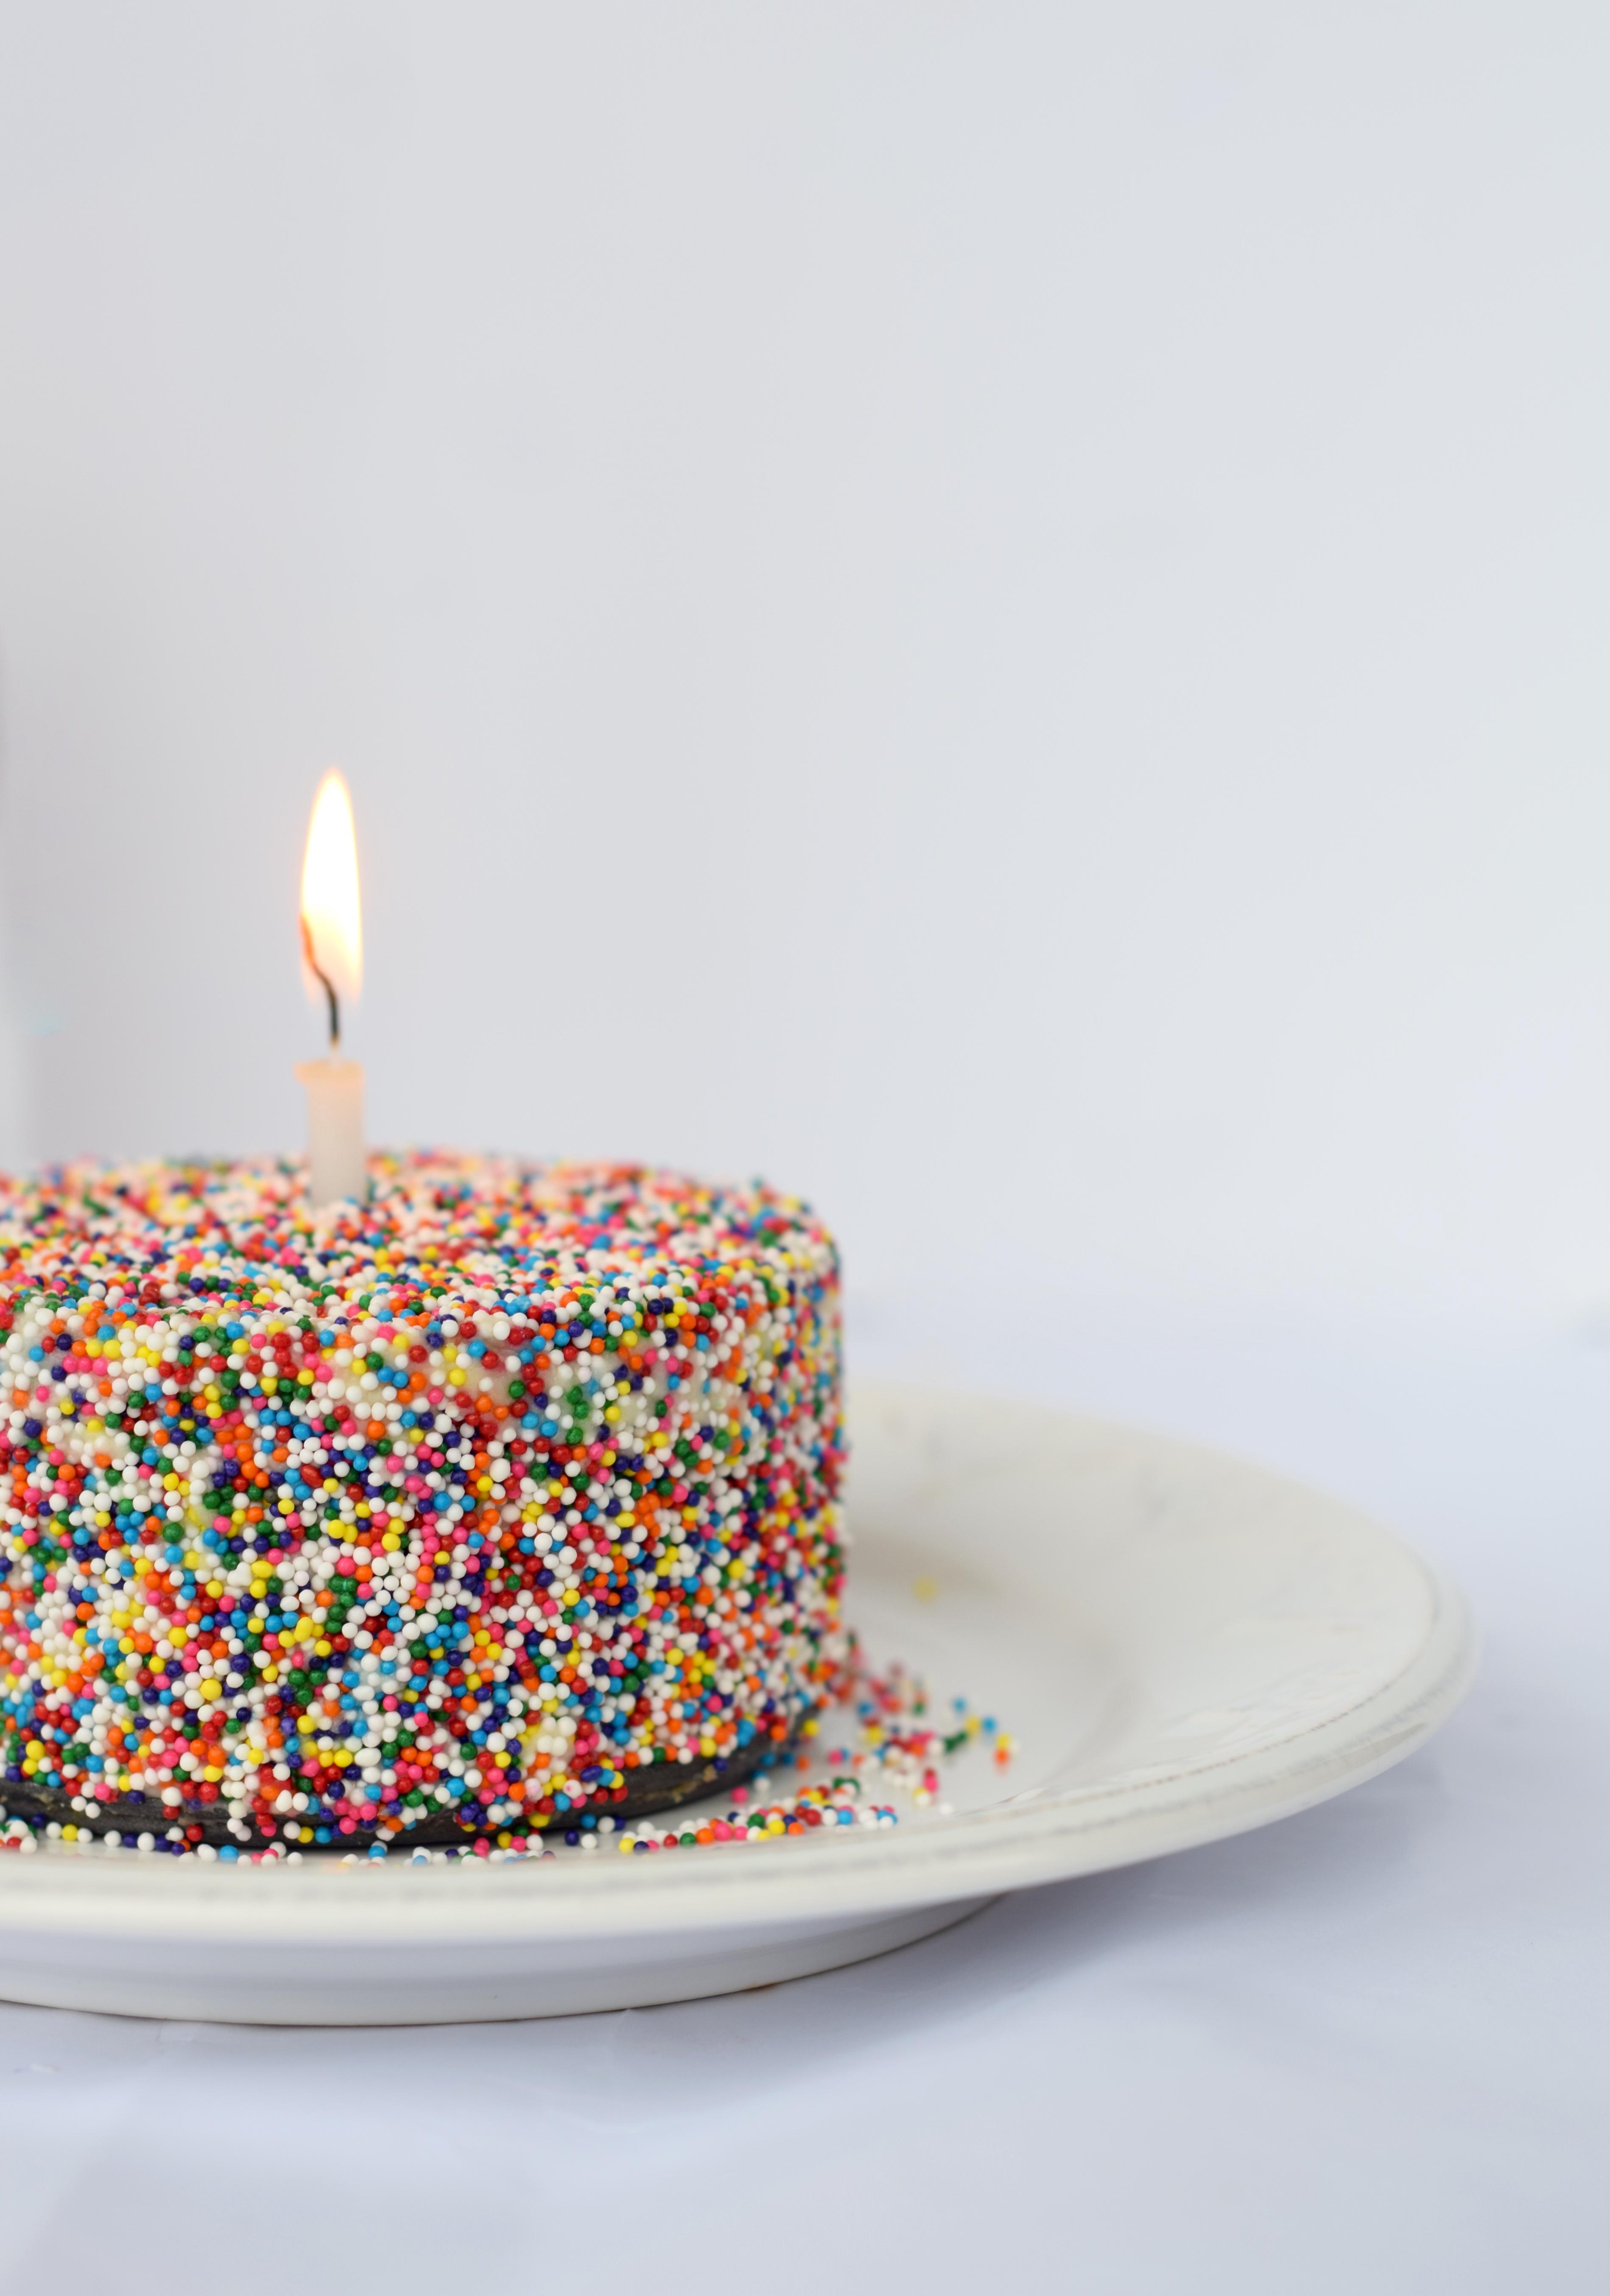 Mini Cake For One Recipe